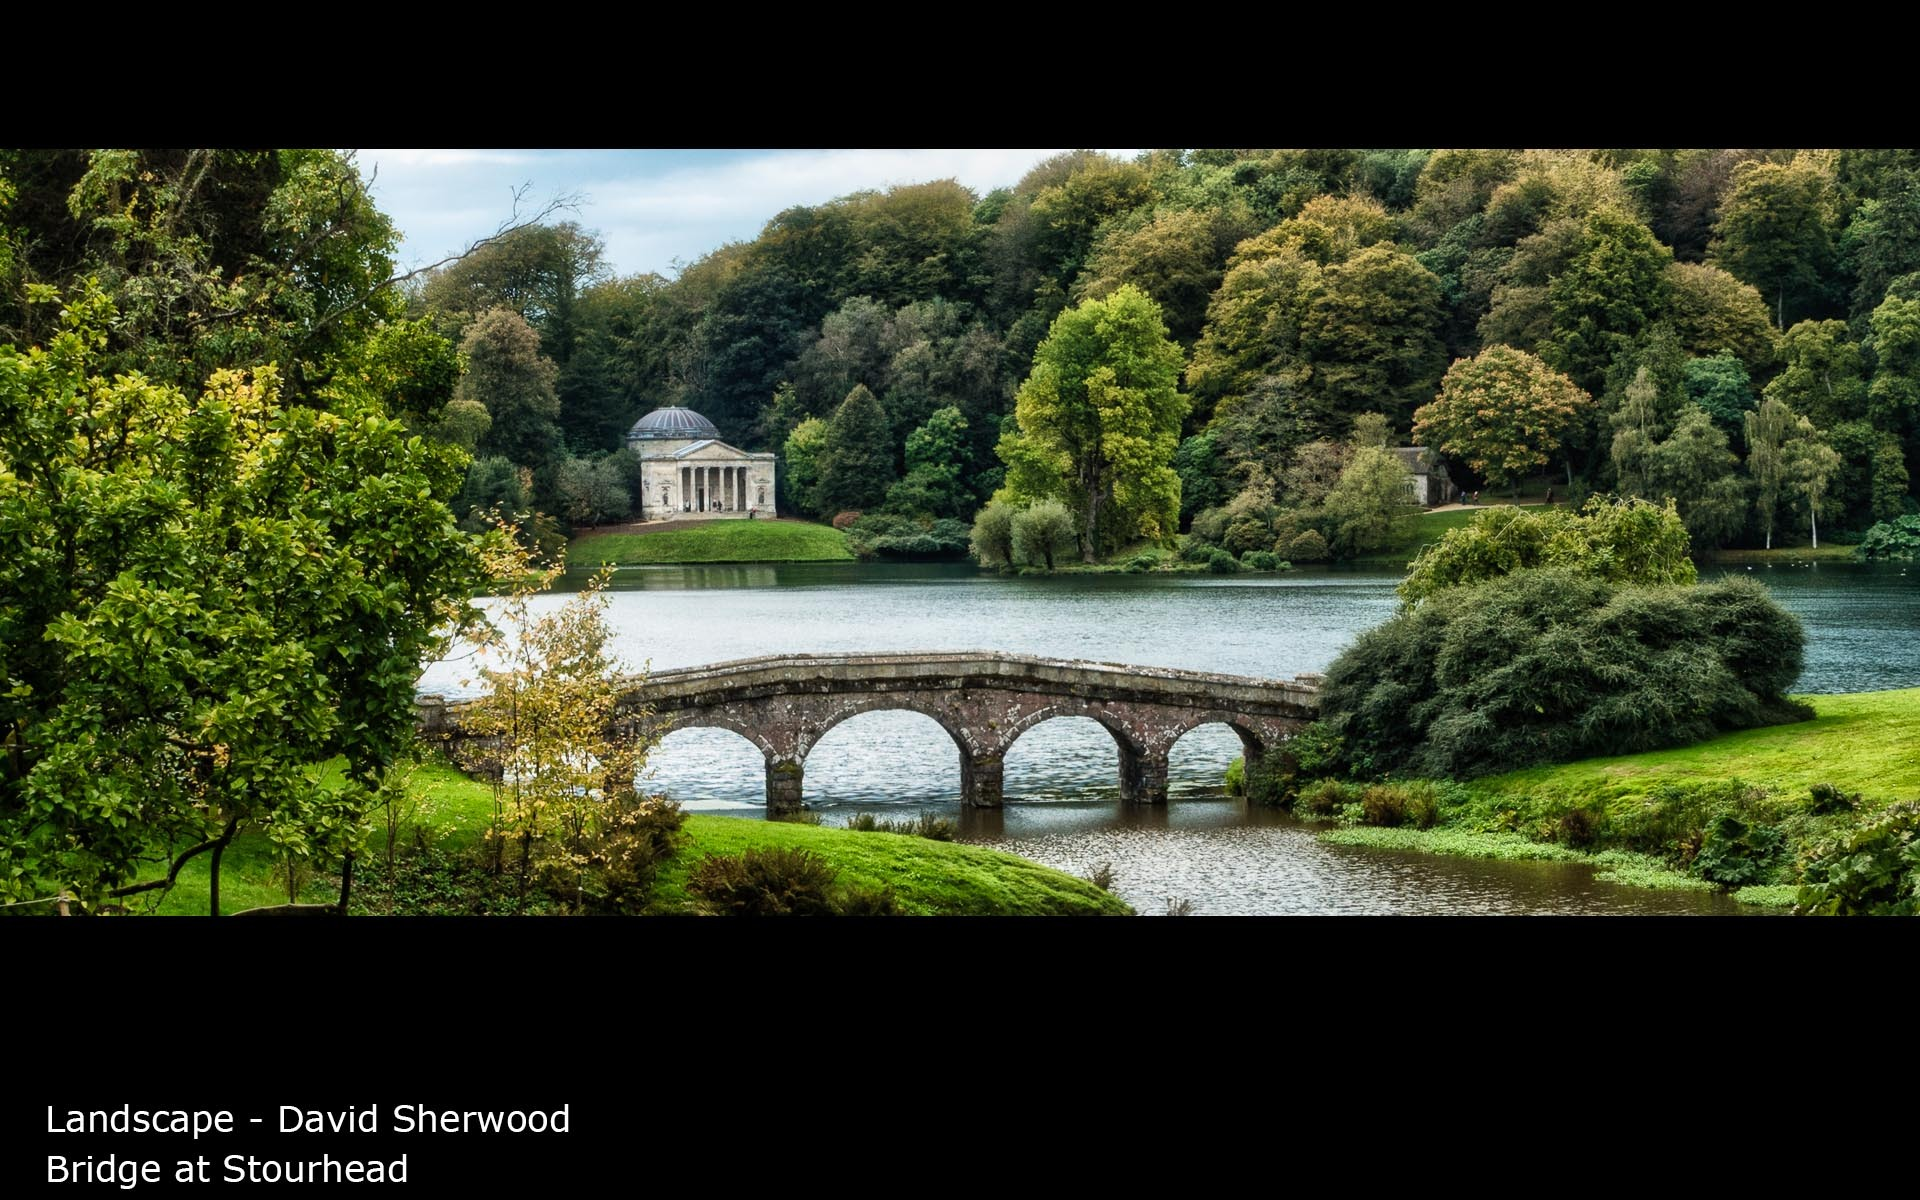 Bridge at Stourhead - David Sherwood